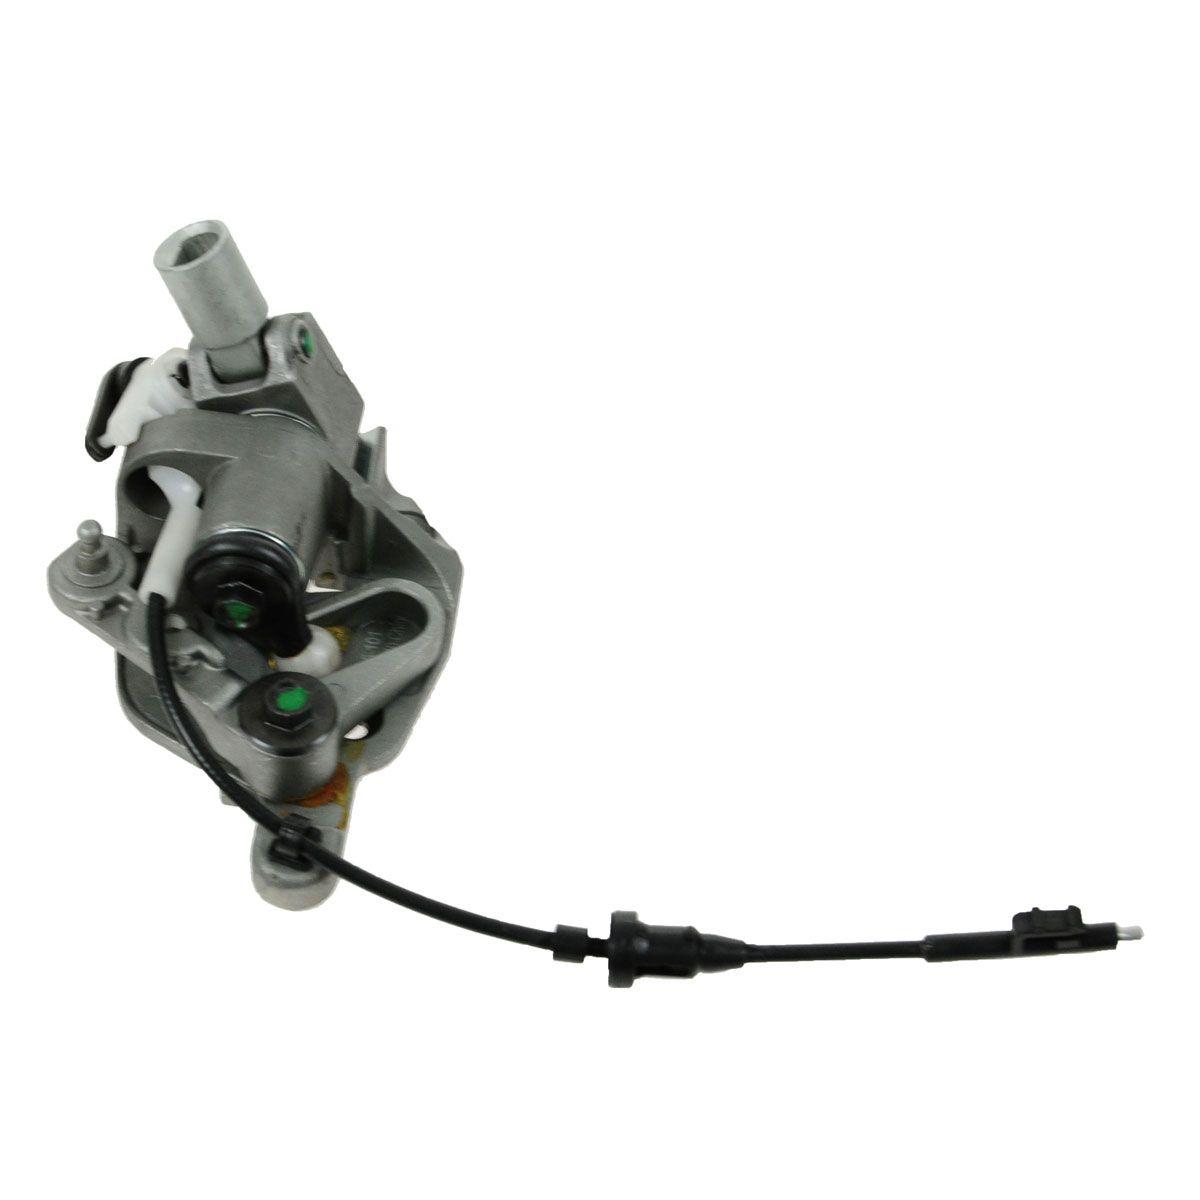 2000 chevy silverado transmission problems autos post Chevy Tilt Steering Column Diagram 2001 Chevy Steering Column Wiring Diagram